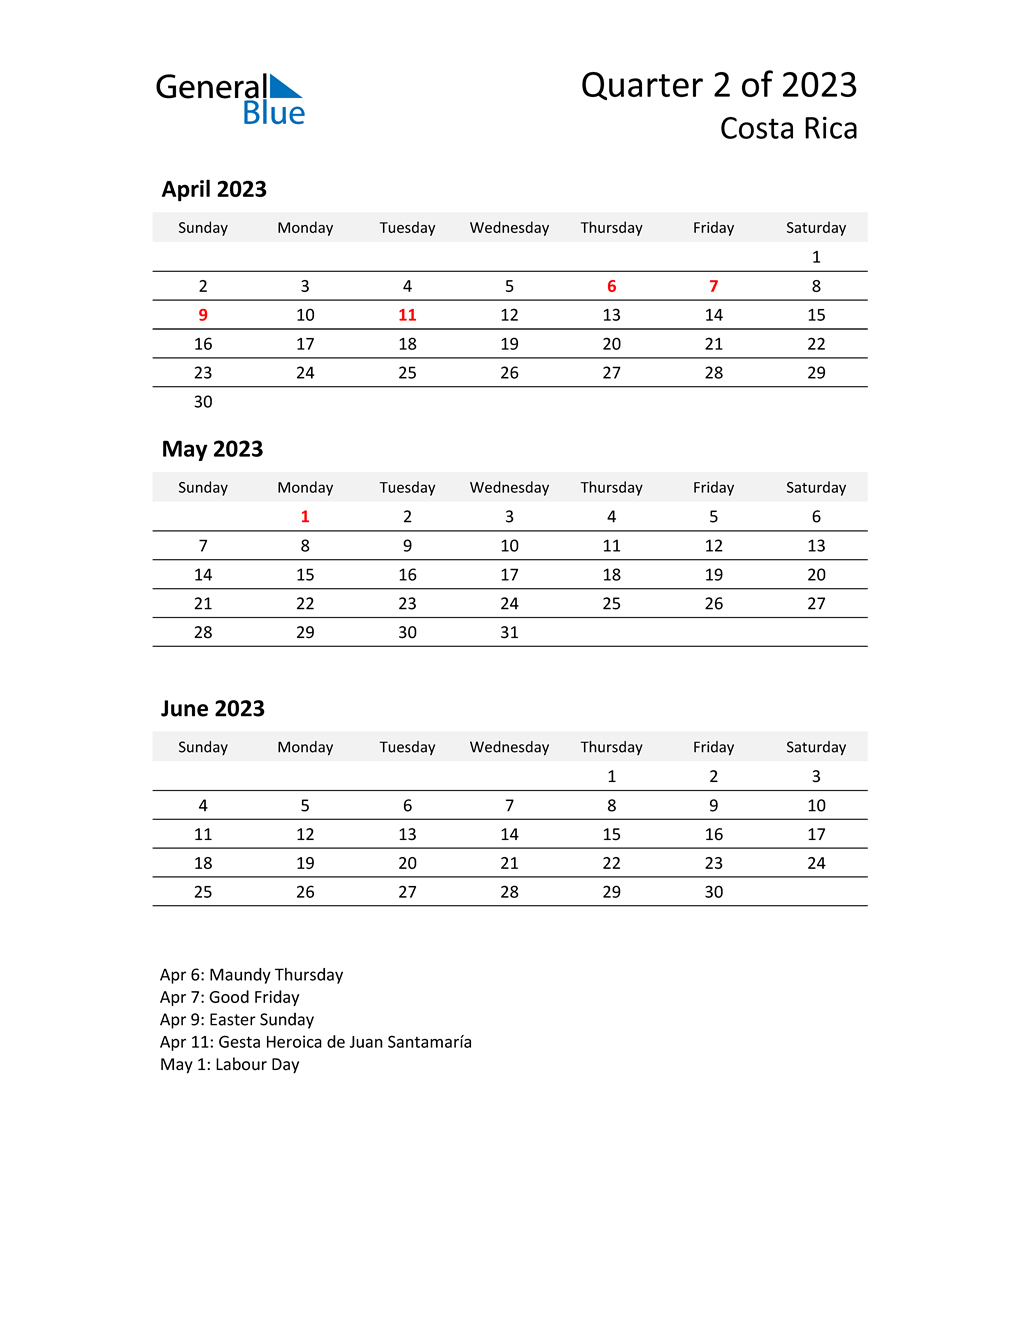 2023 Three-Month Calendar for Costa Rica